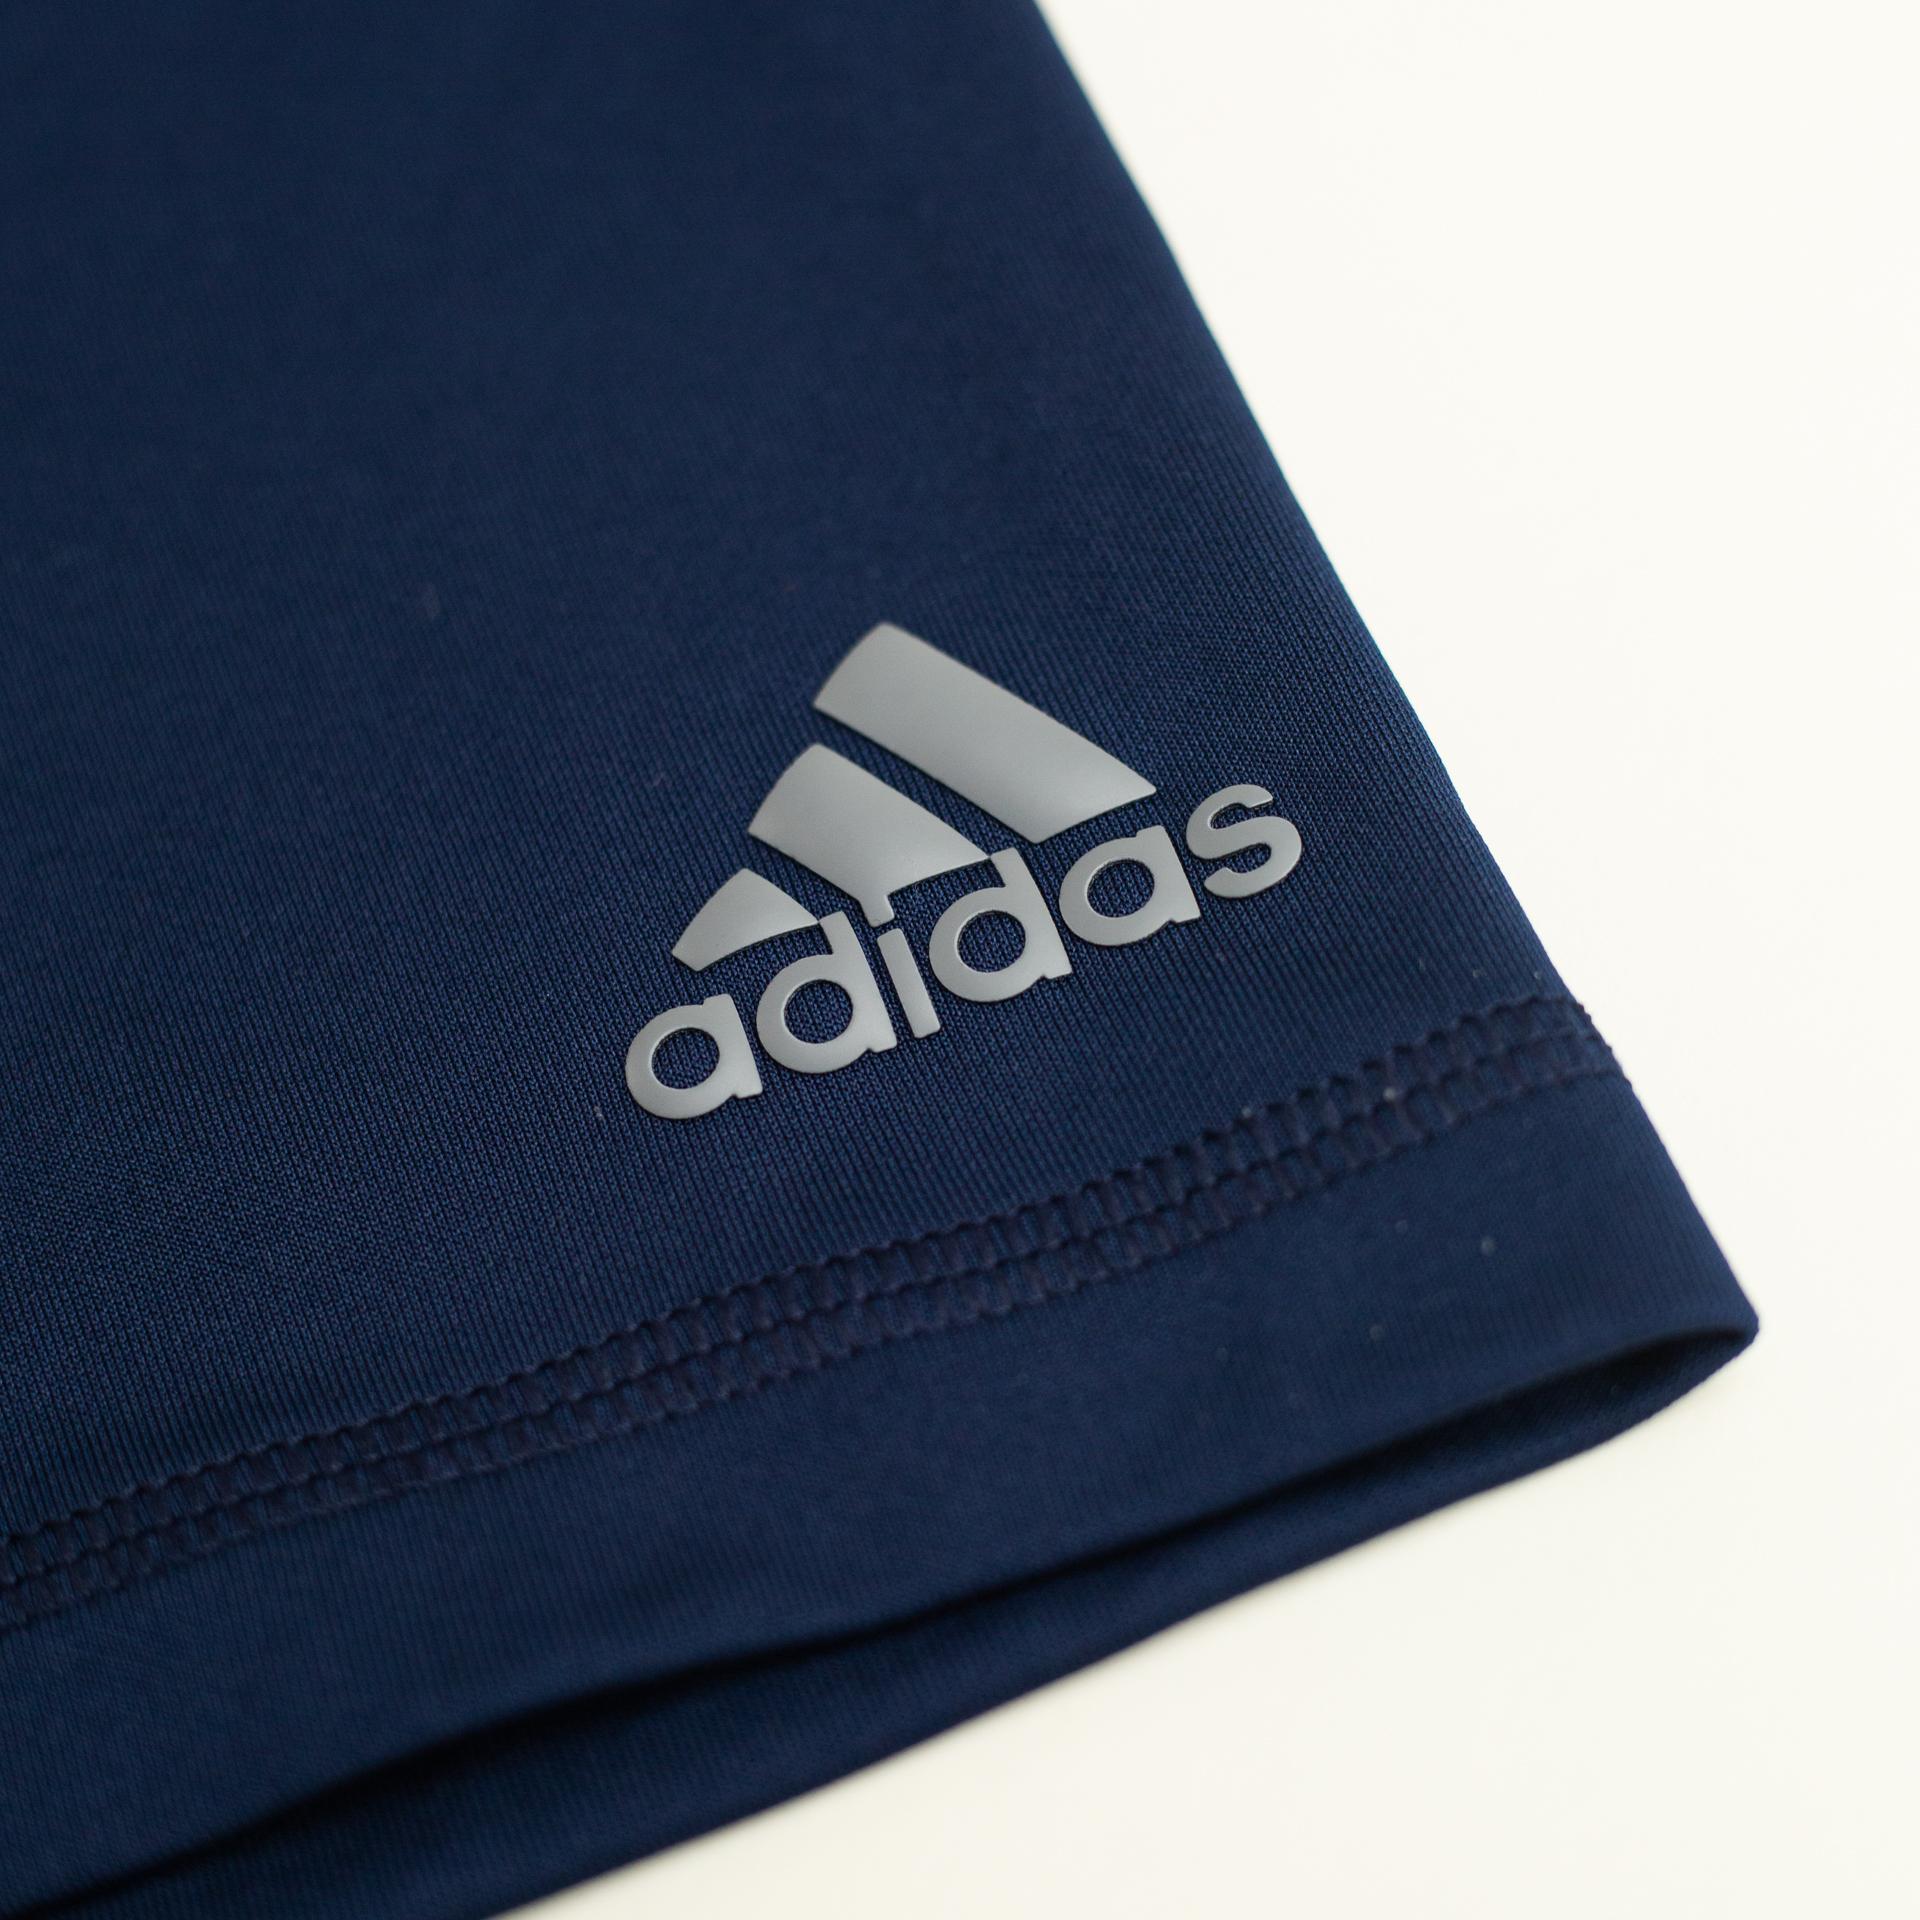 Andrew Kyne #11 Adidas Shersey